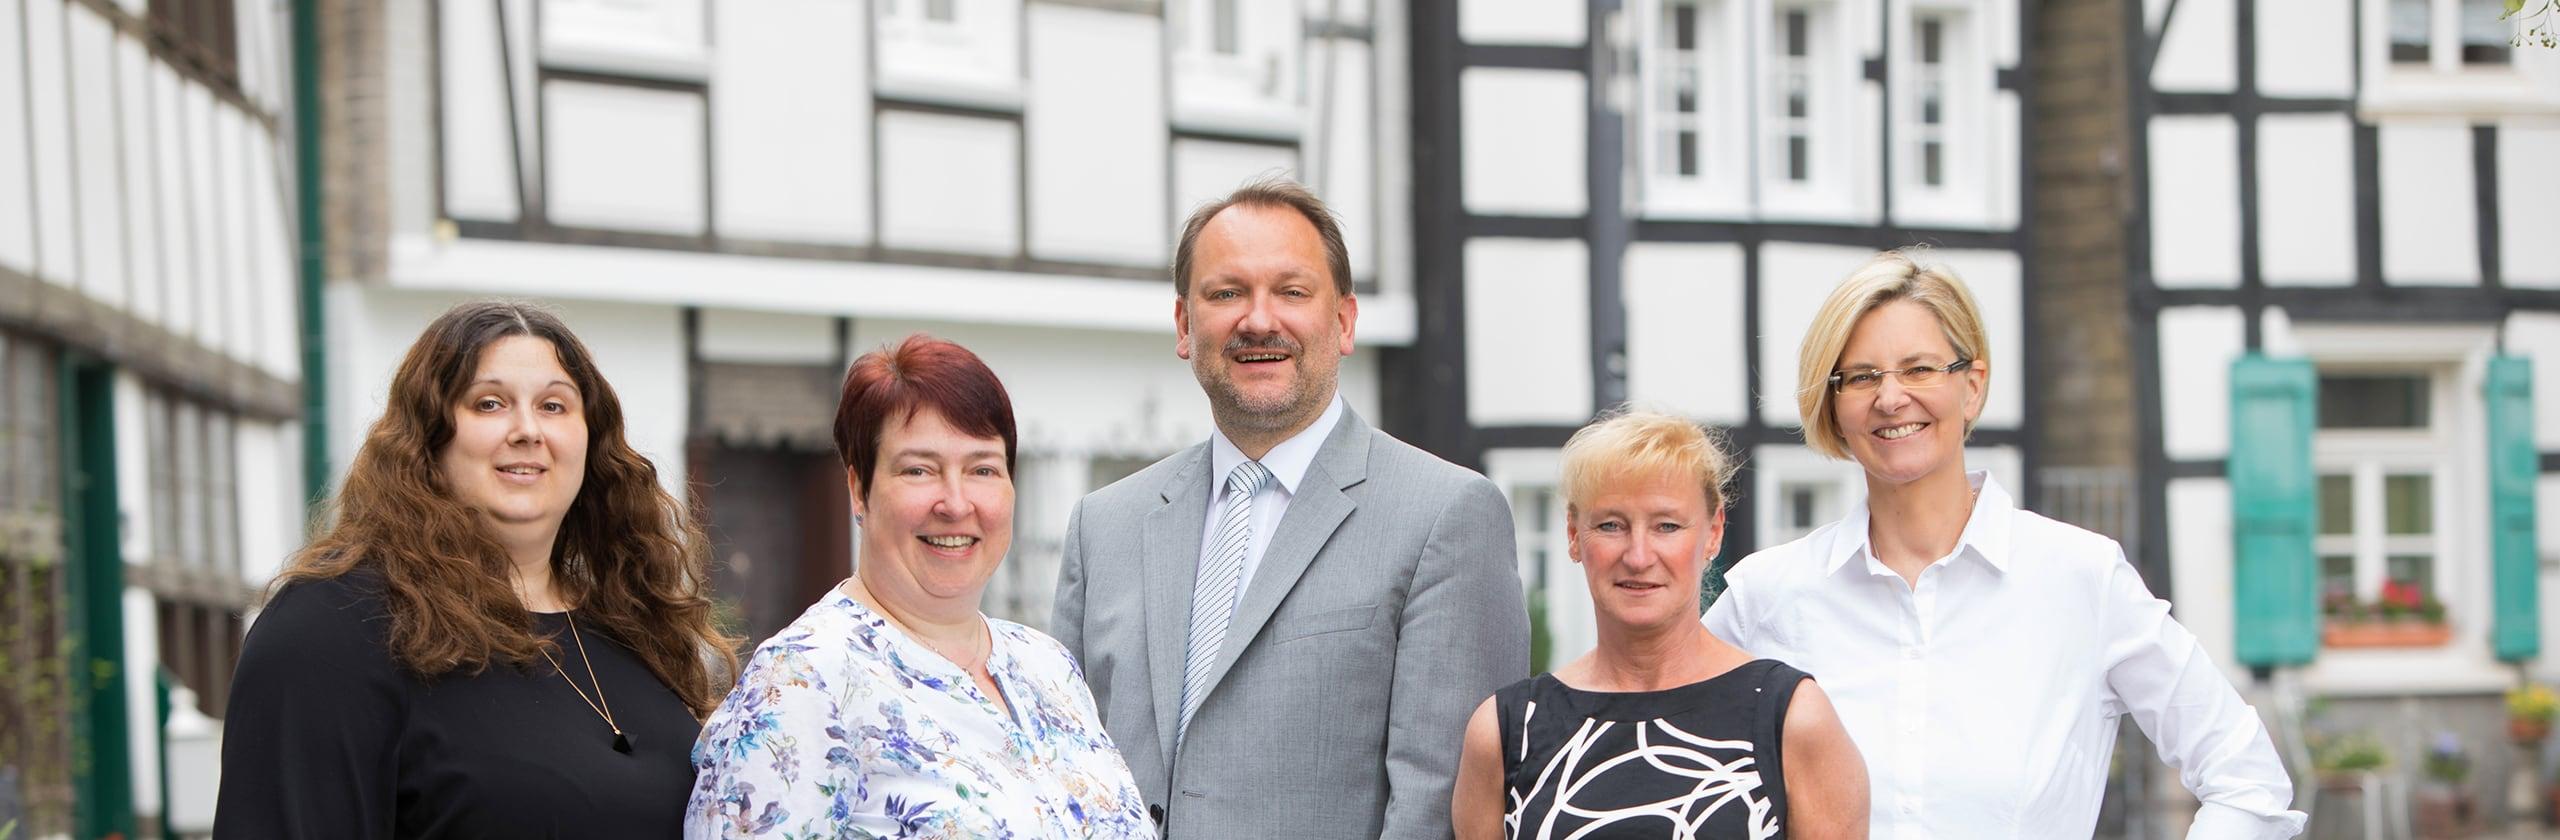 Das Team der Rechtsanwaltskanzlei Markus Matzkeit